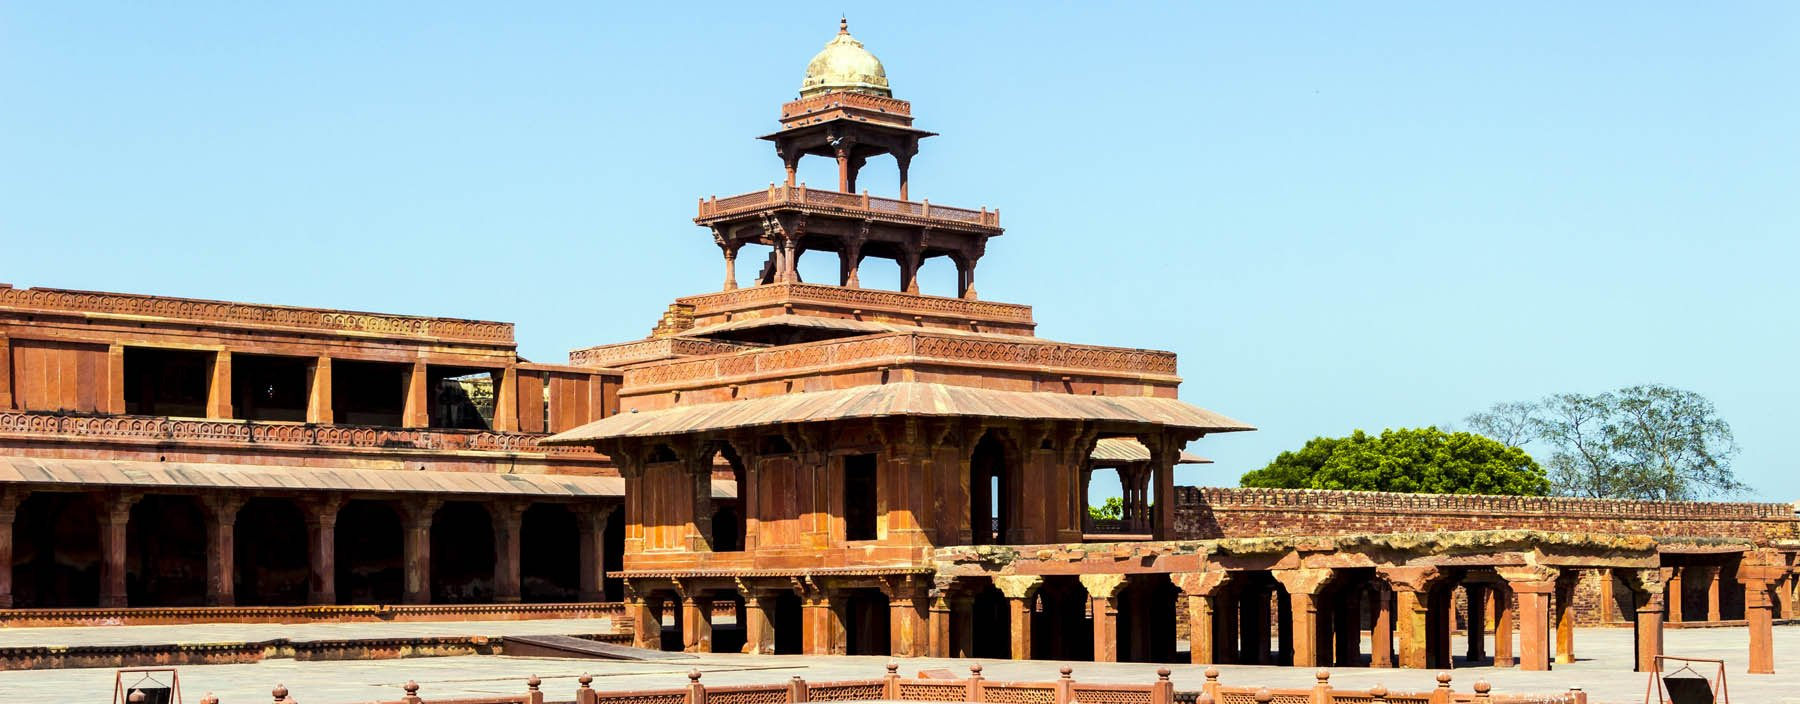 in, fatehpur sikri (1).jpg